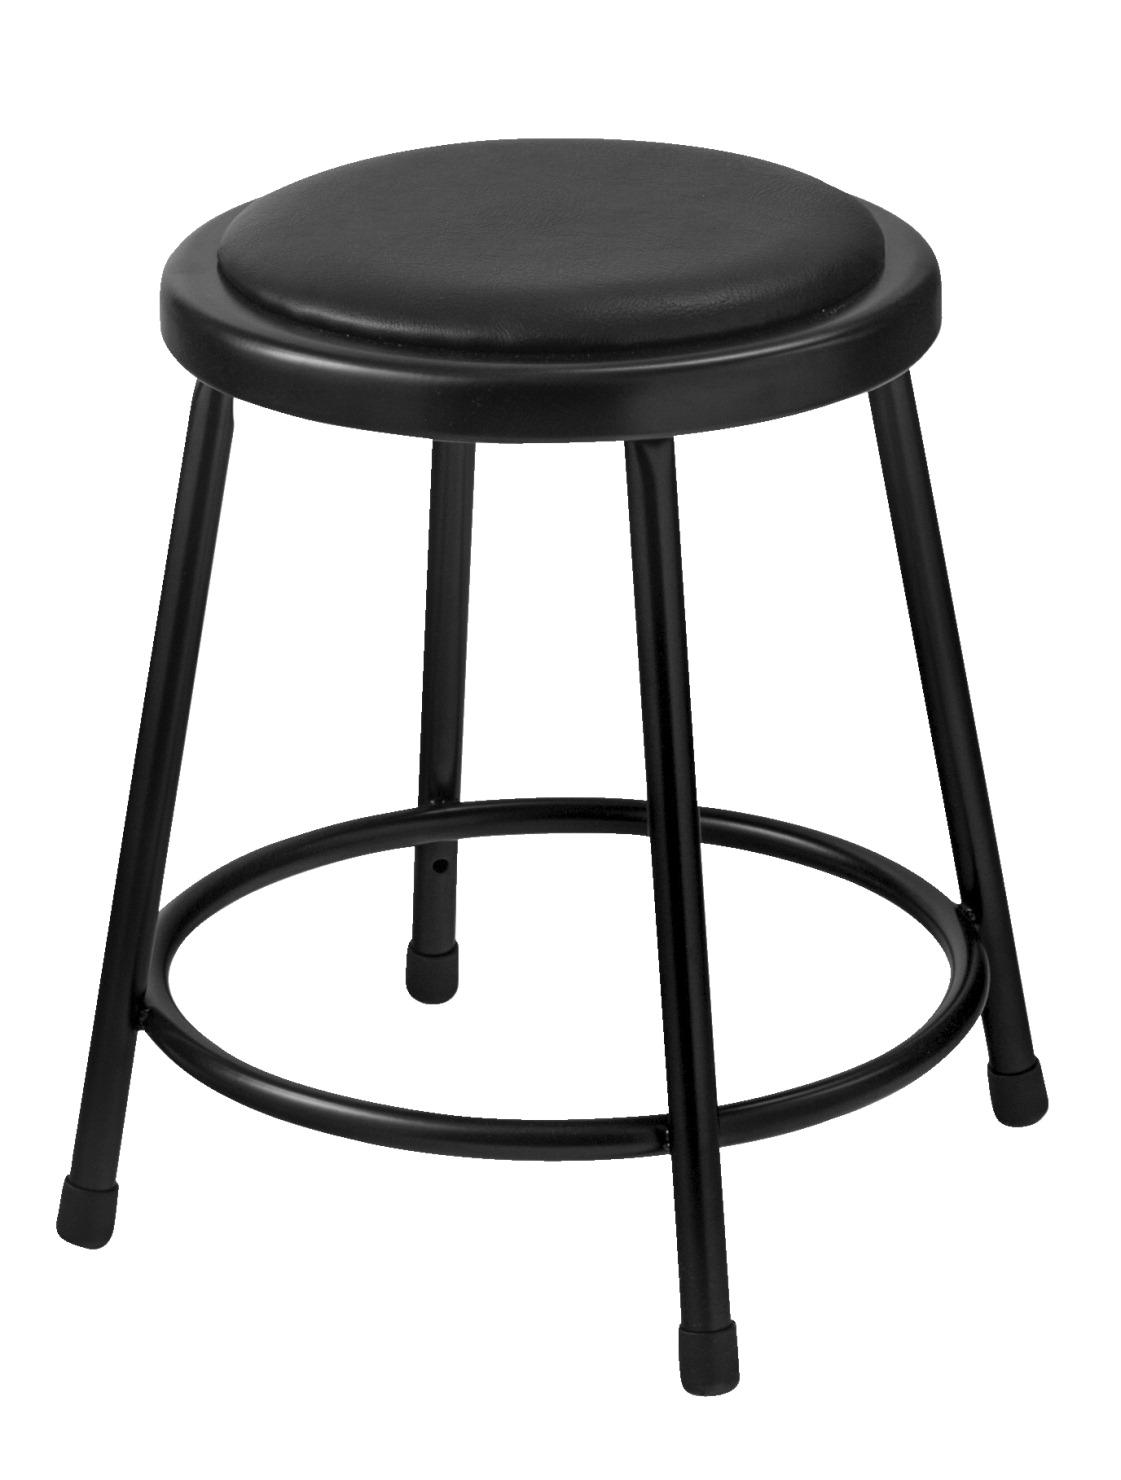 Peachy National Public Seating Heavy Duty Vinyl Padded Steel Stool 18 Inch Black Machost Co Dining Chair Design Ideas Machostcouk